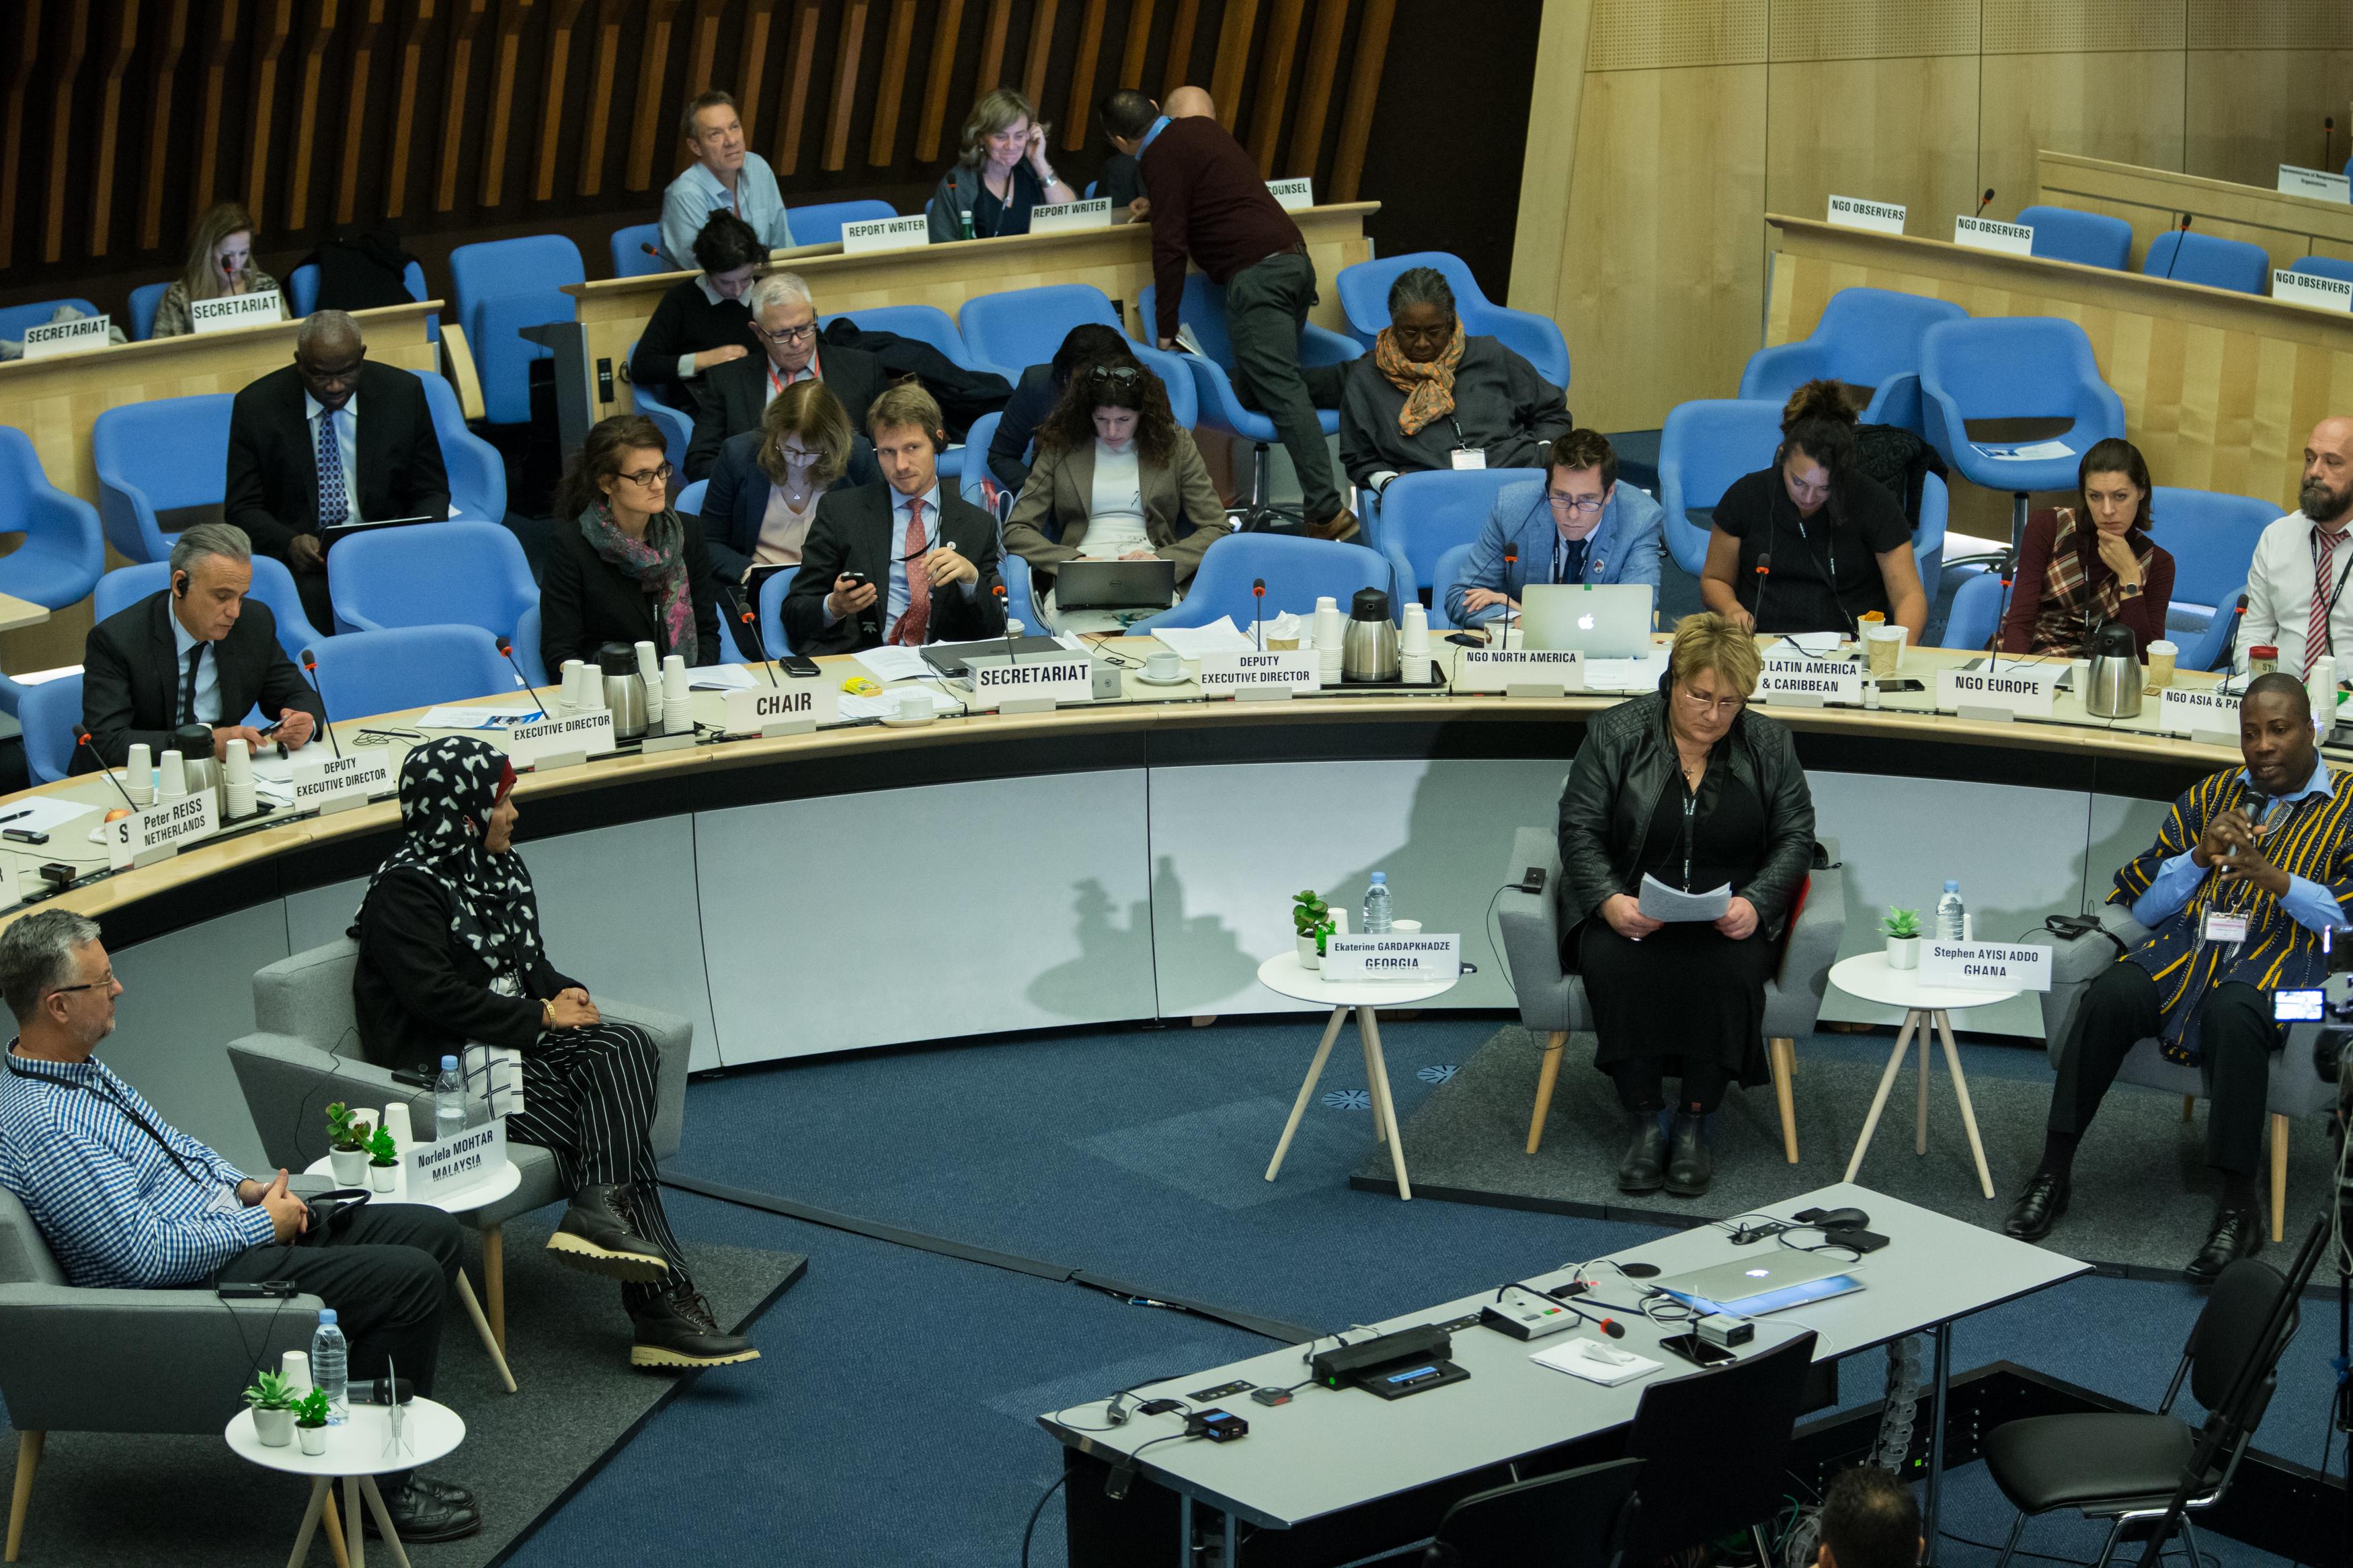 39th Meeting of the UNAIDS Programme Coordinating Board, December 8, 2016, Geneva, Switzerland. ©UNAIDS/Pierre Albouy